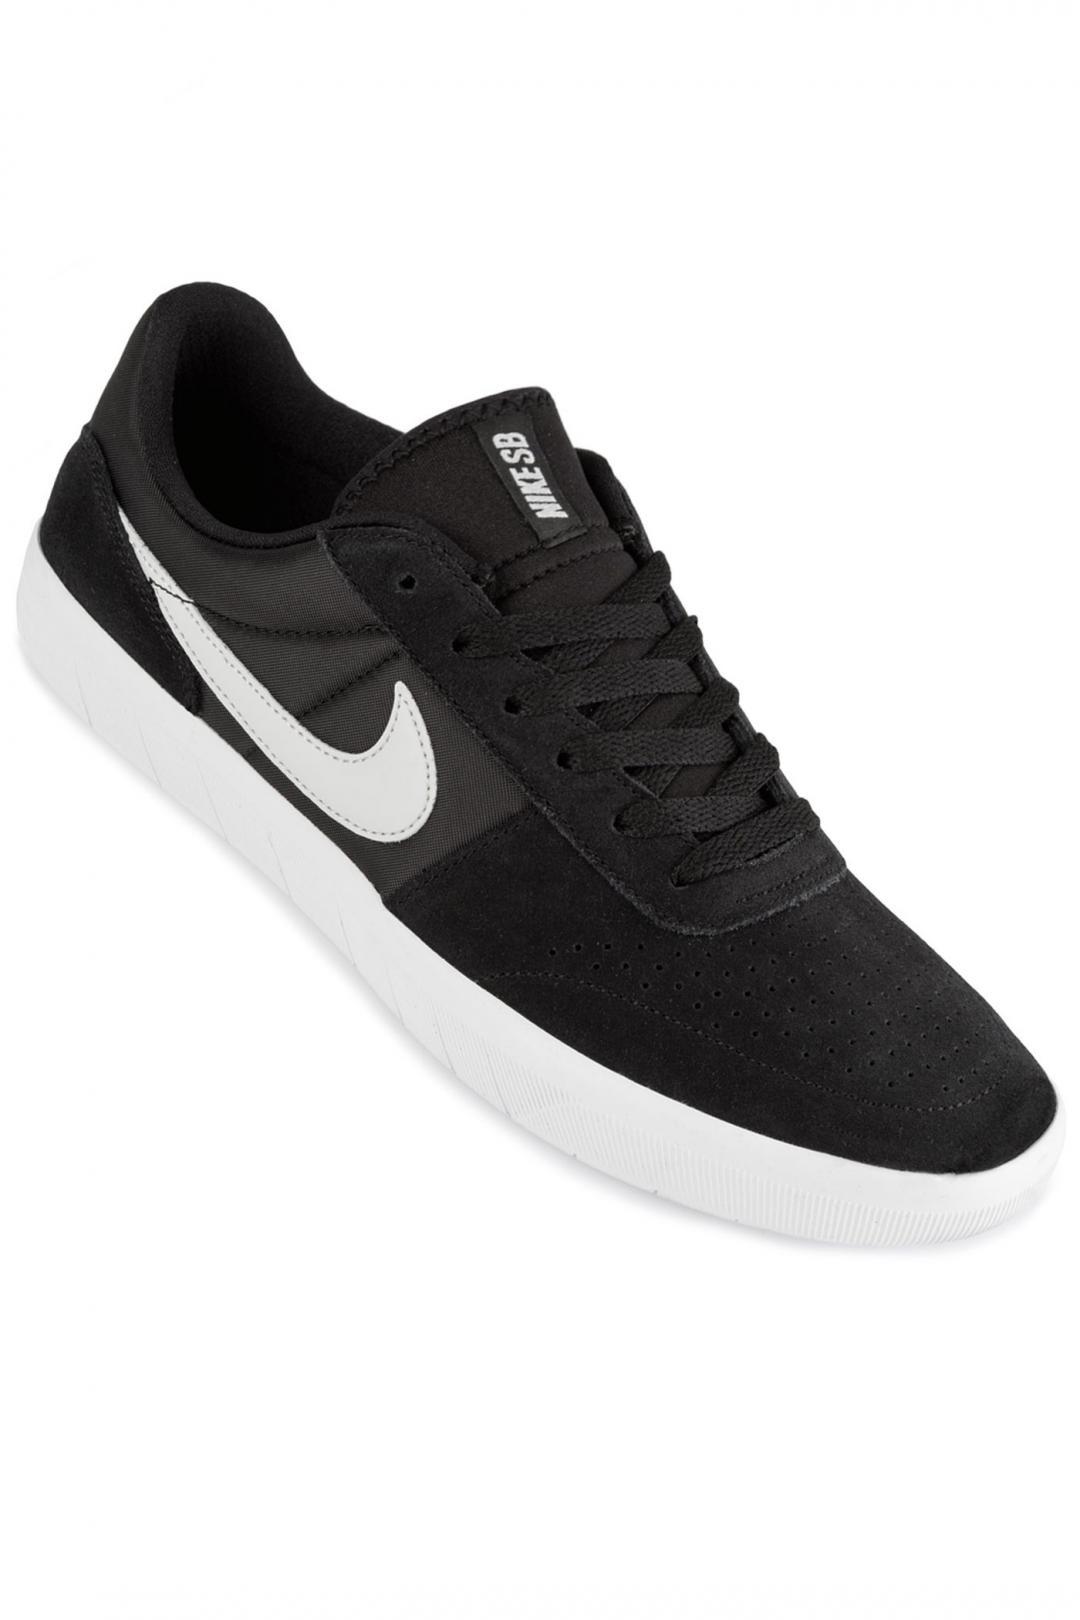 Uomo Nike SB Team Classic black white   Scarpe da skate